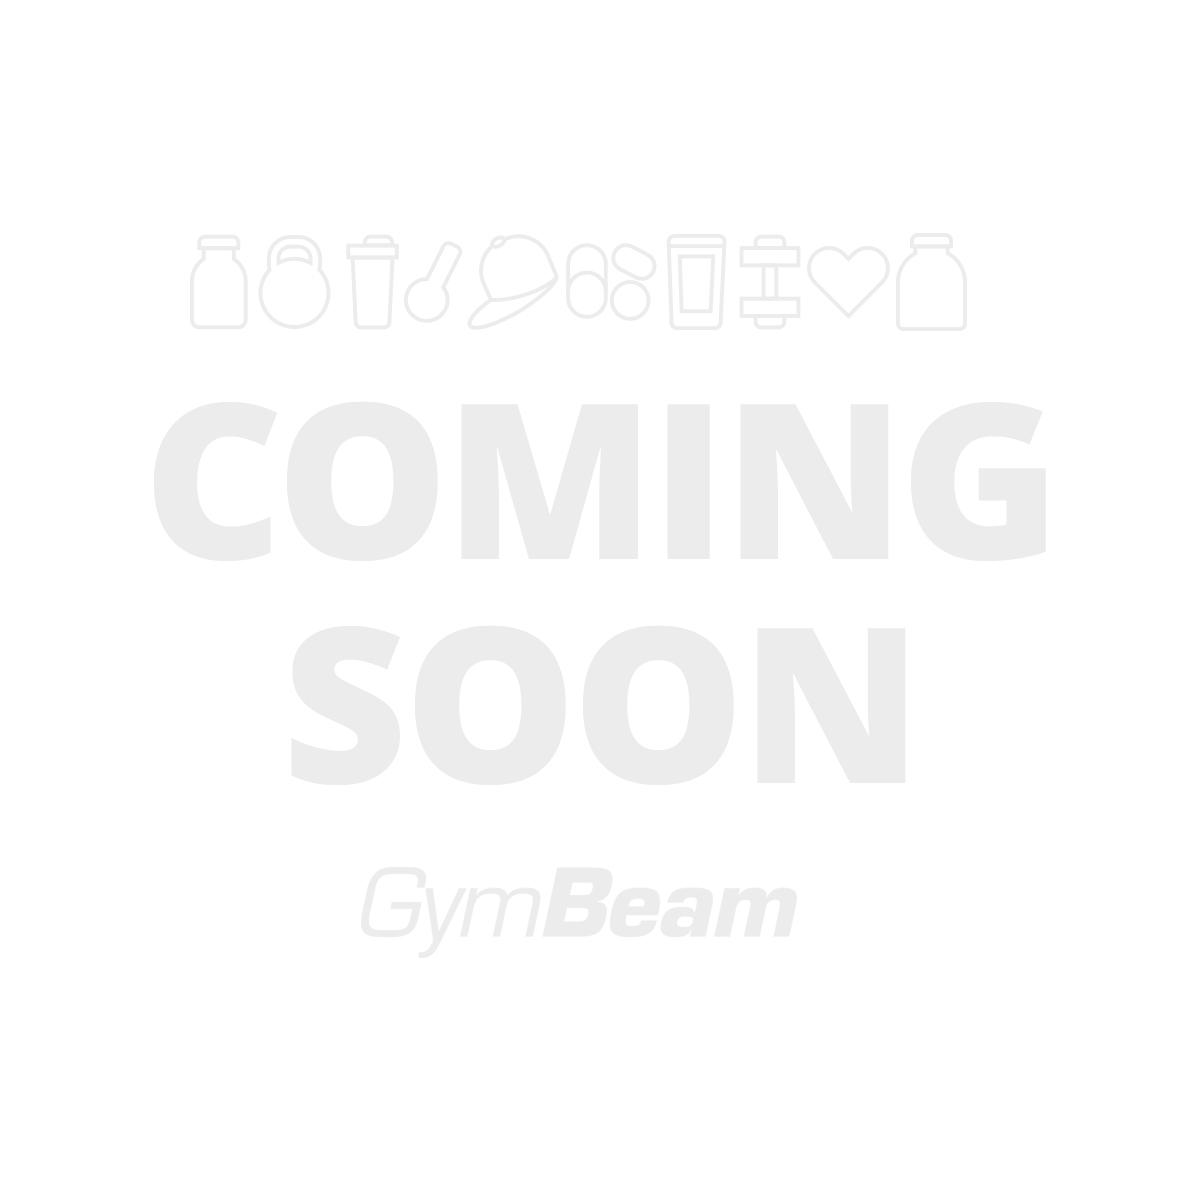 Fitness belt Arnold - GymBeam